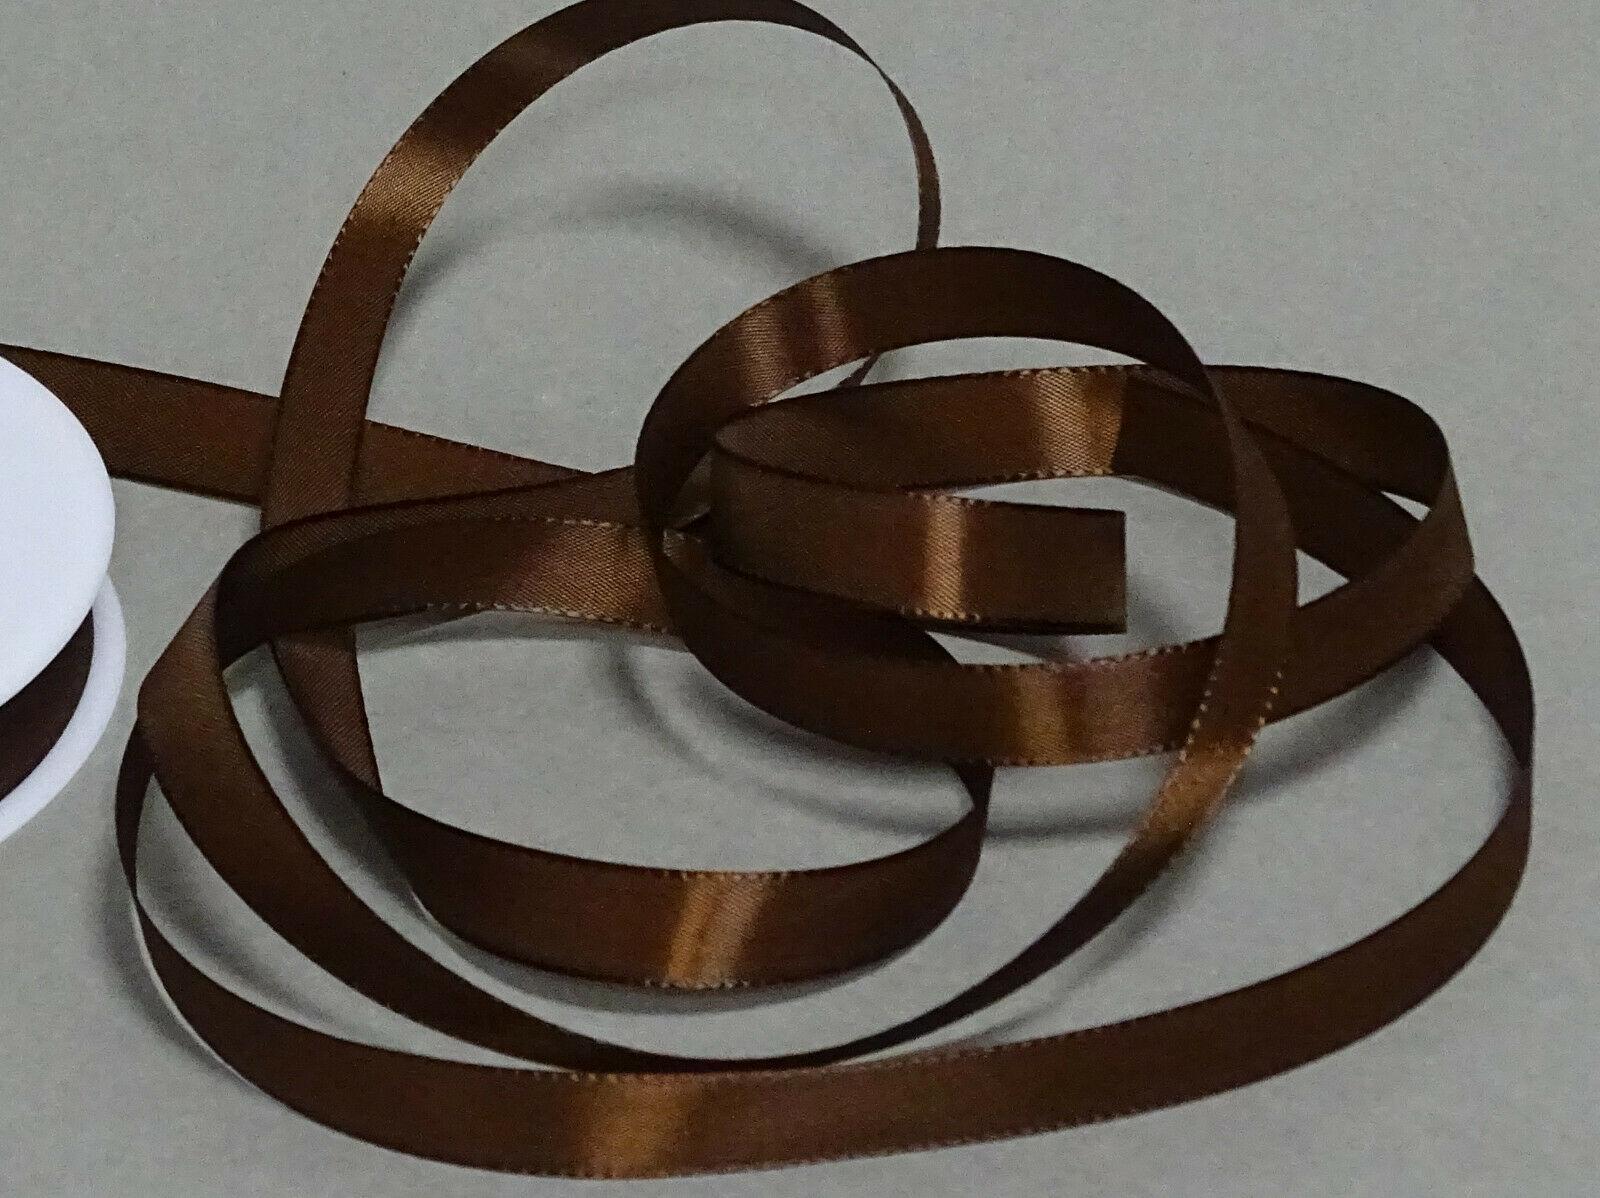 Seidenband Schleifenband 50 m x 15 mm / 40 mm Dekoband ab 0,08 €/m Geschenkband  - Braun 132, 40 mm x 50 m